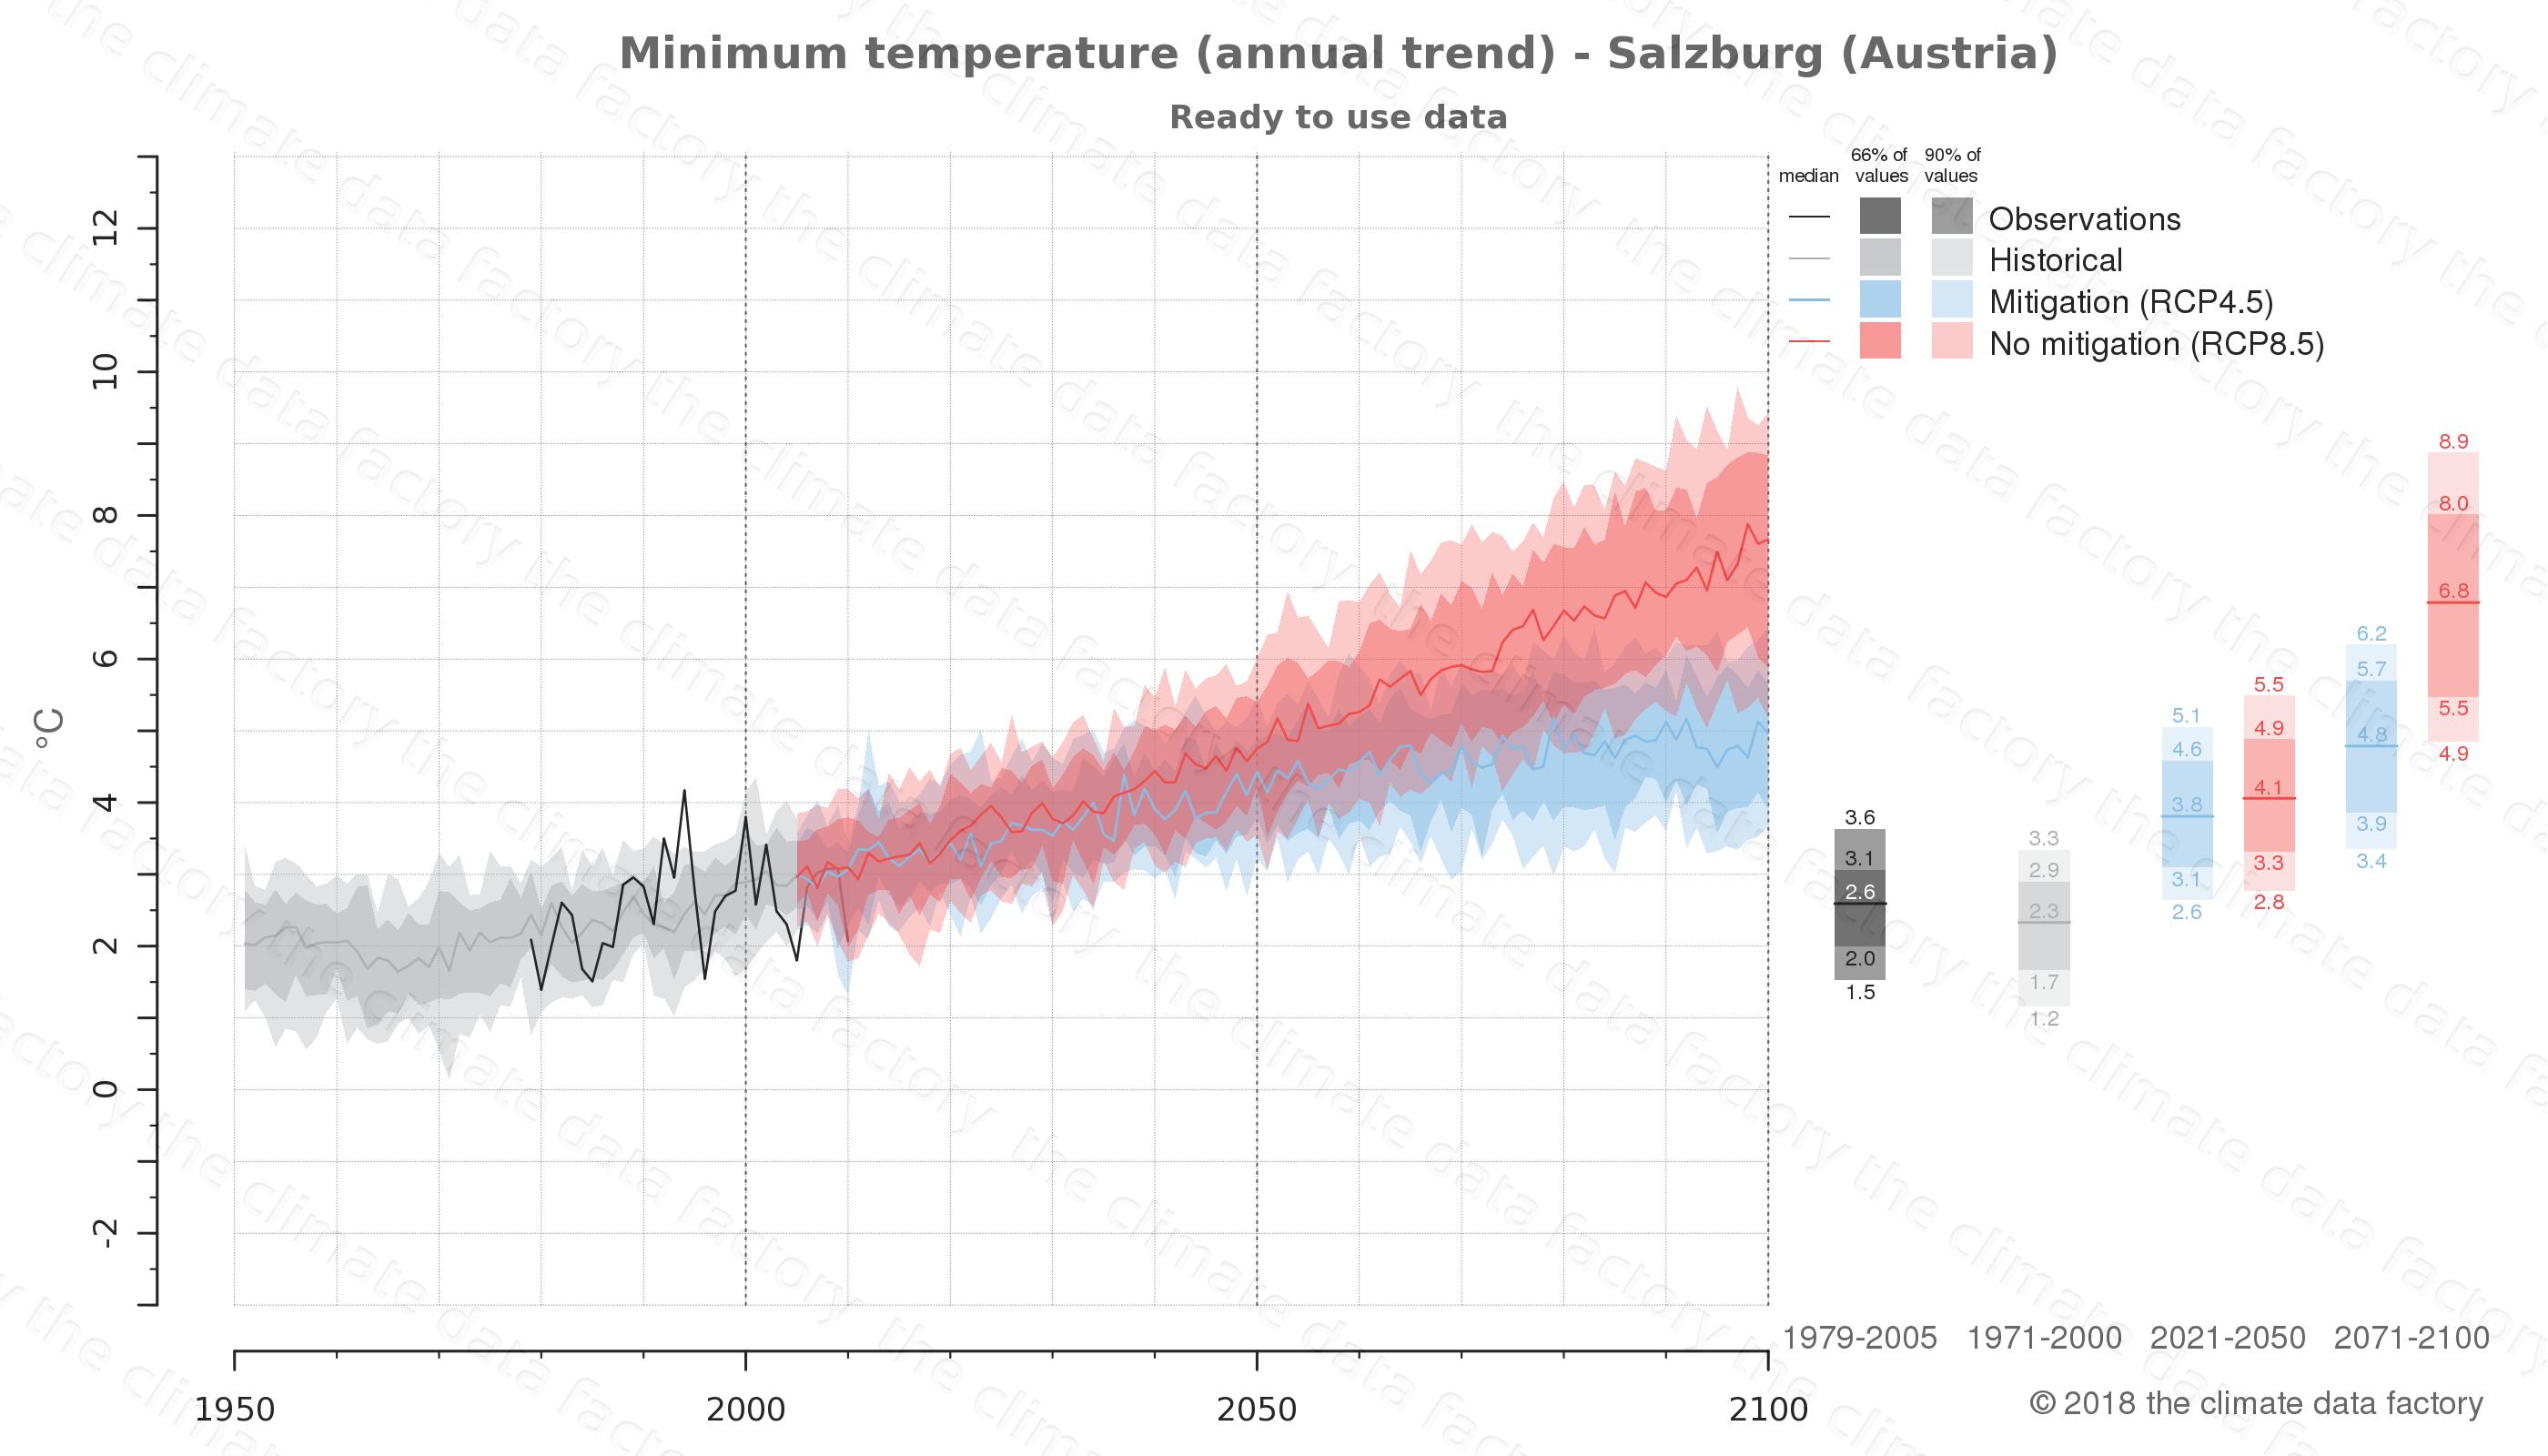 climate change data policy adaptation climate graph city data minimum-temperature salzburg austria